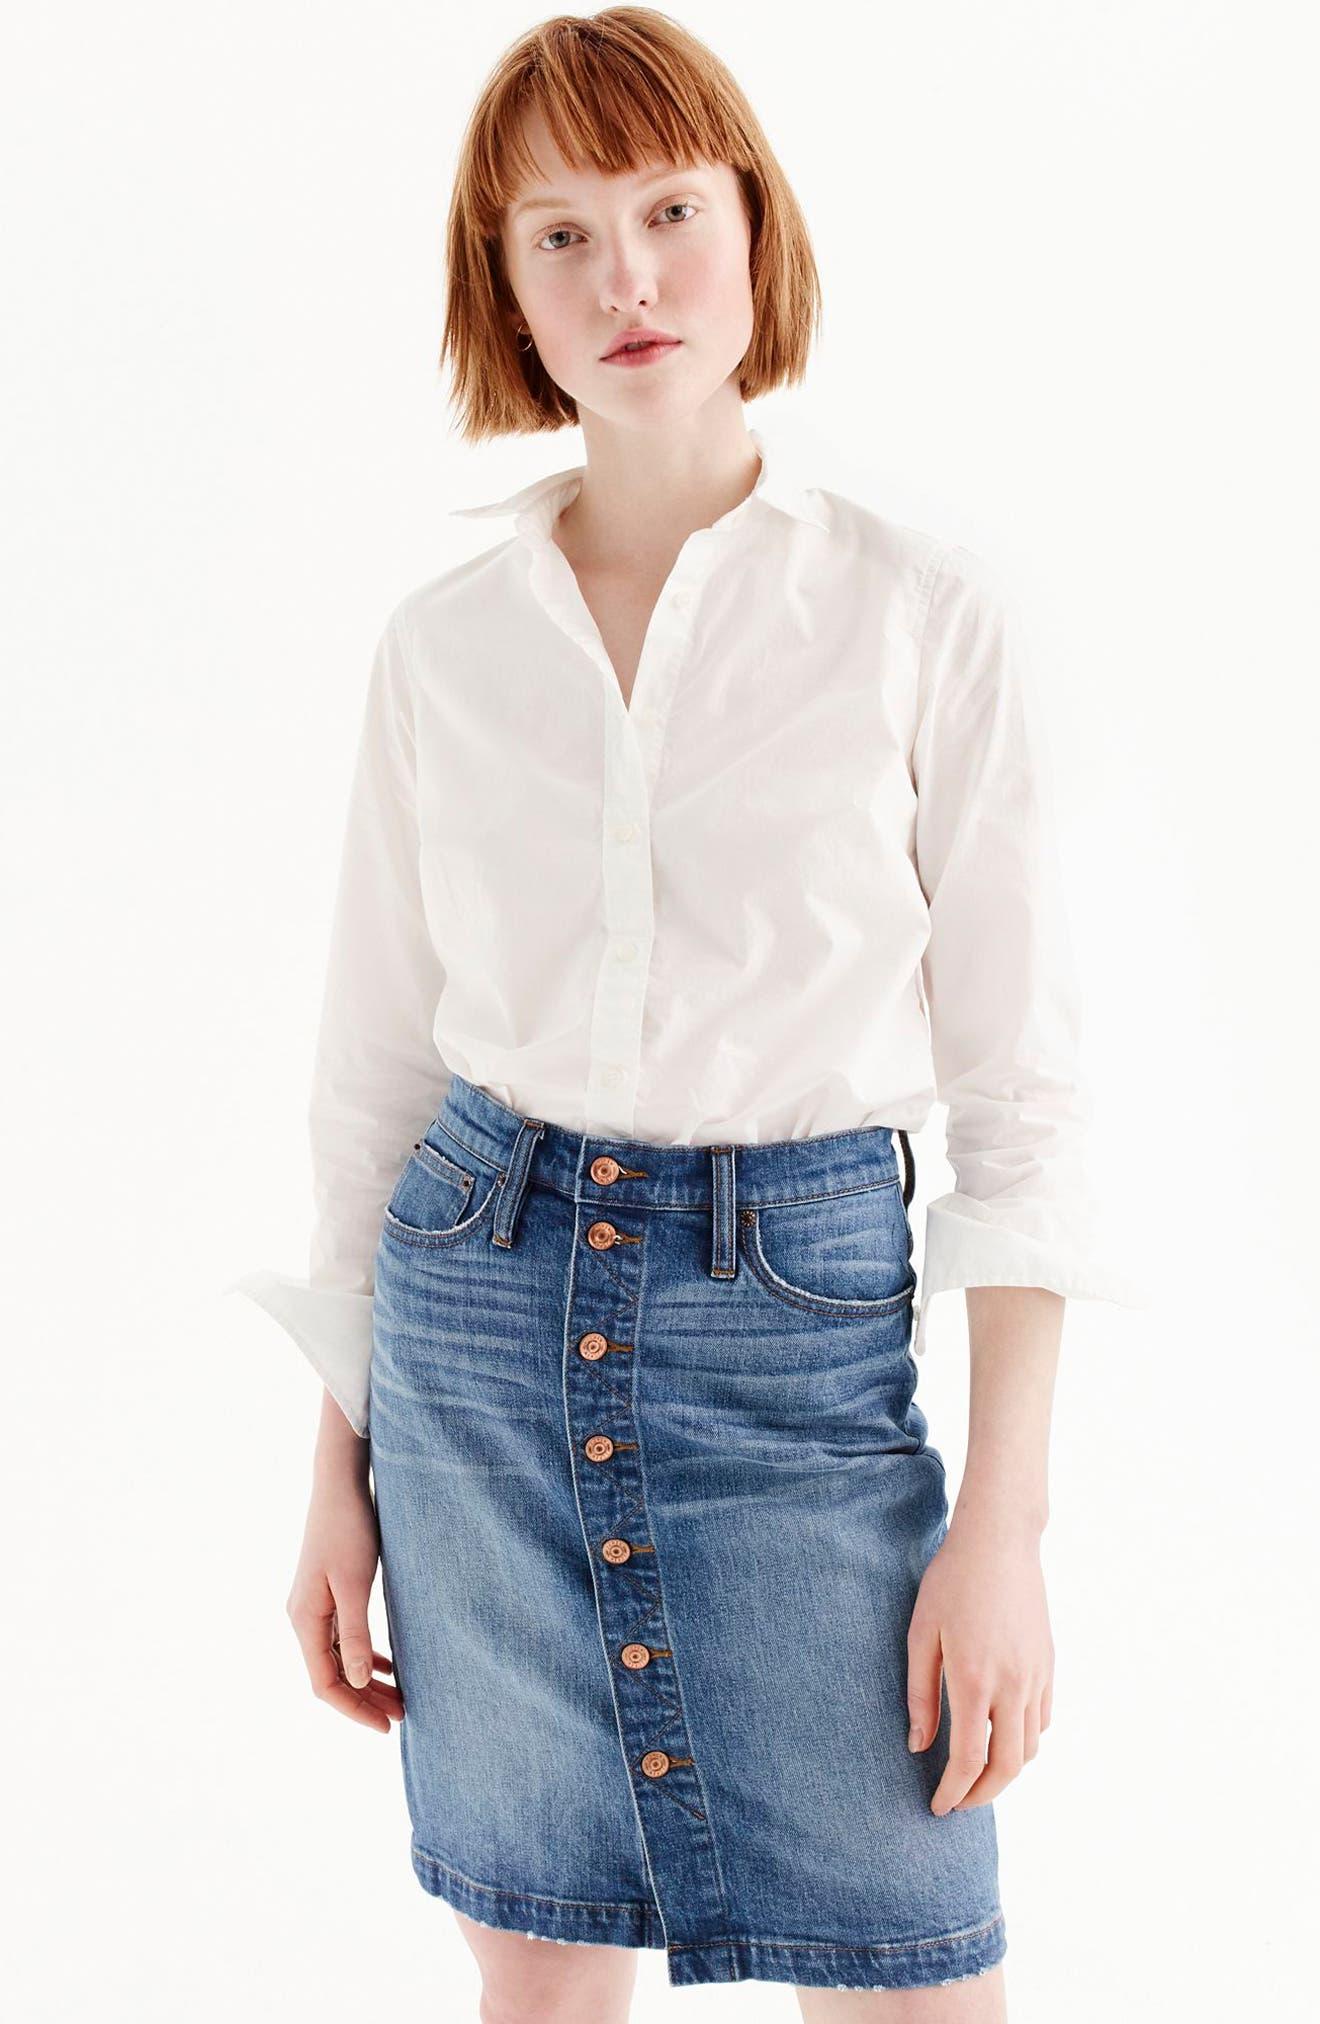 J.Crew New Perfect Cotton Poplin Shirt,                             Main thumbnail 1, color,                             White